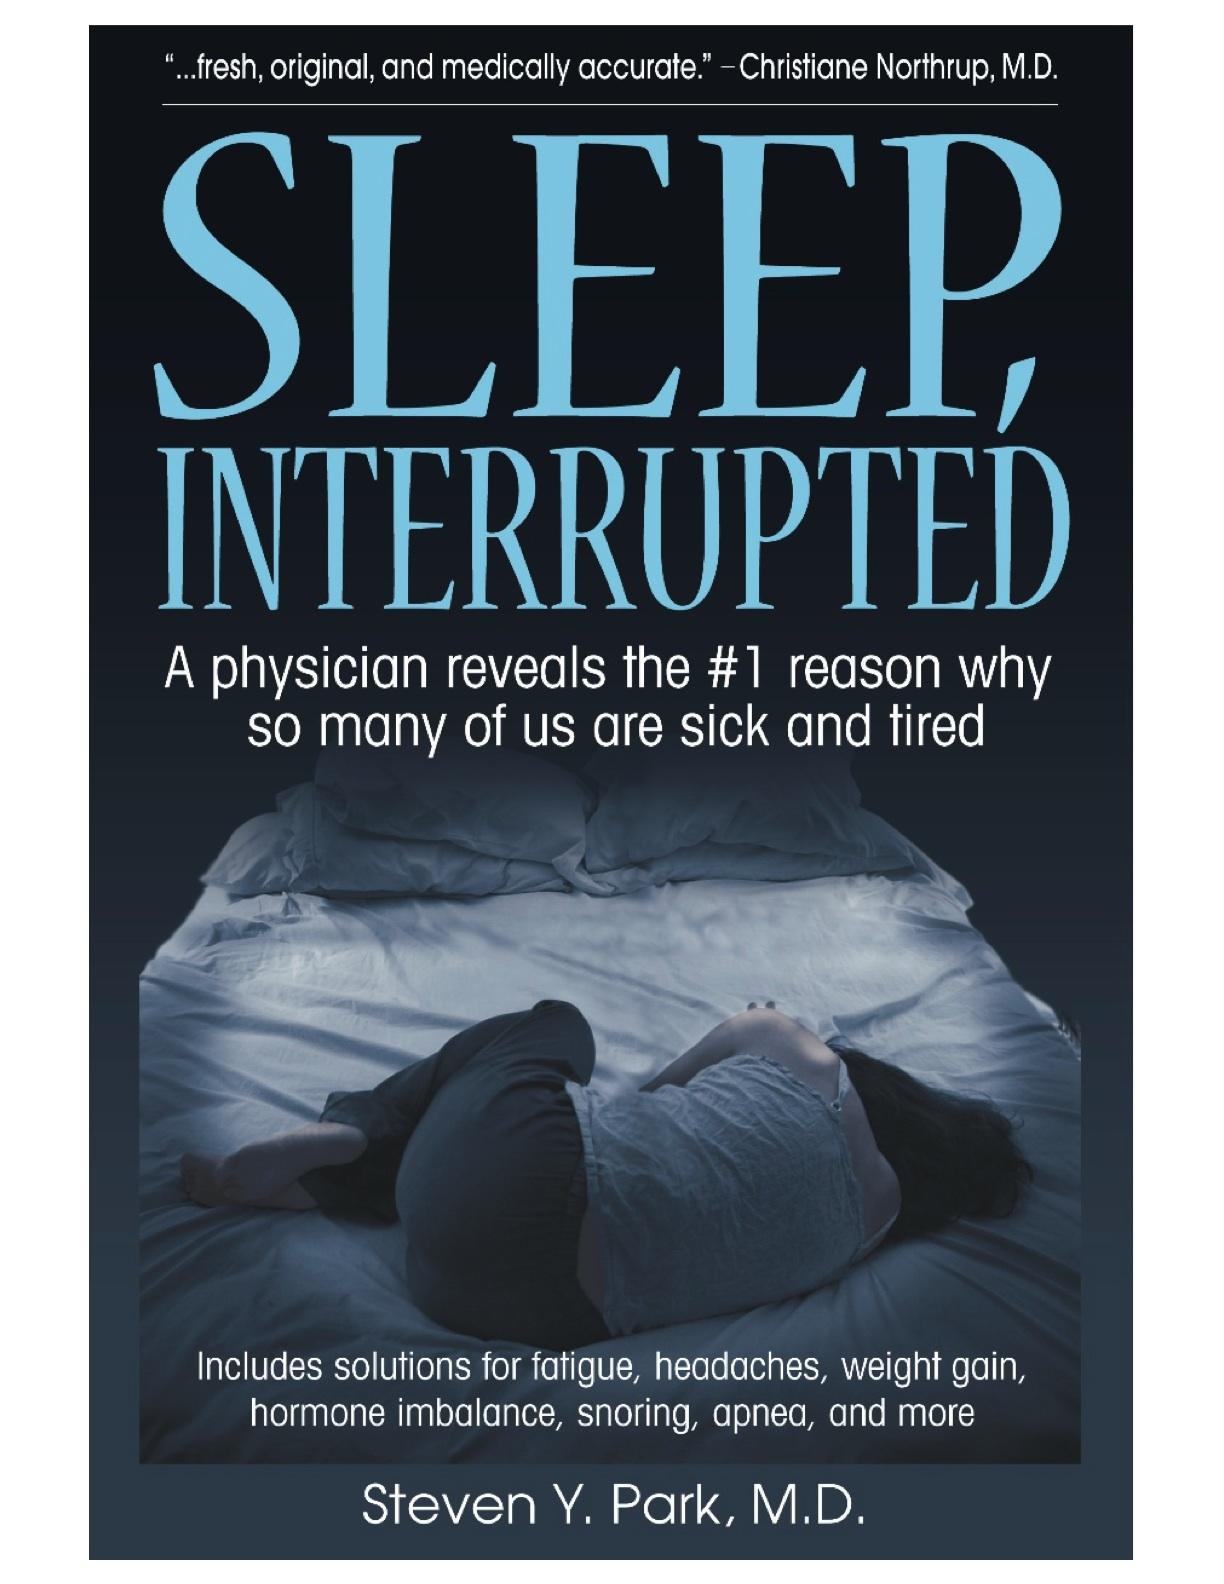 Sleep interrupted ebook doctor steven y park md new york sleep fandeluxe Ebook collections